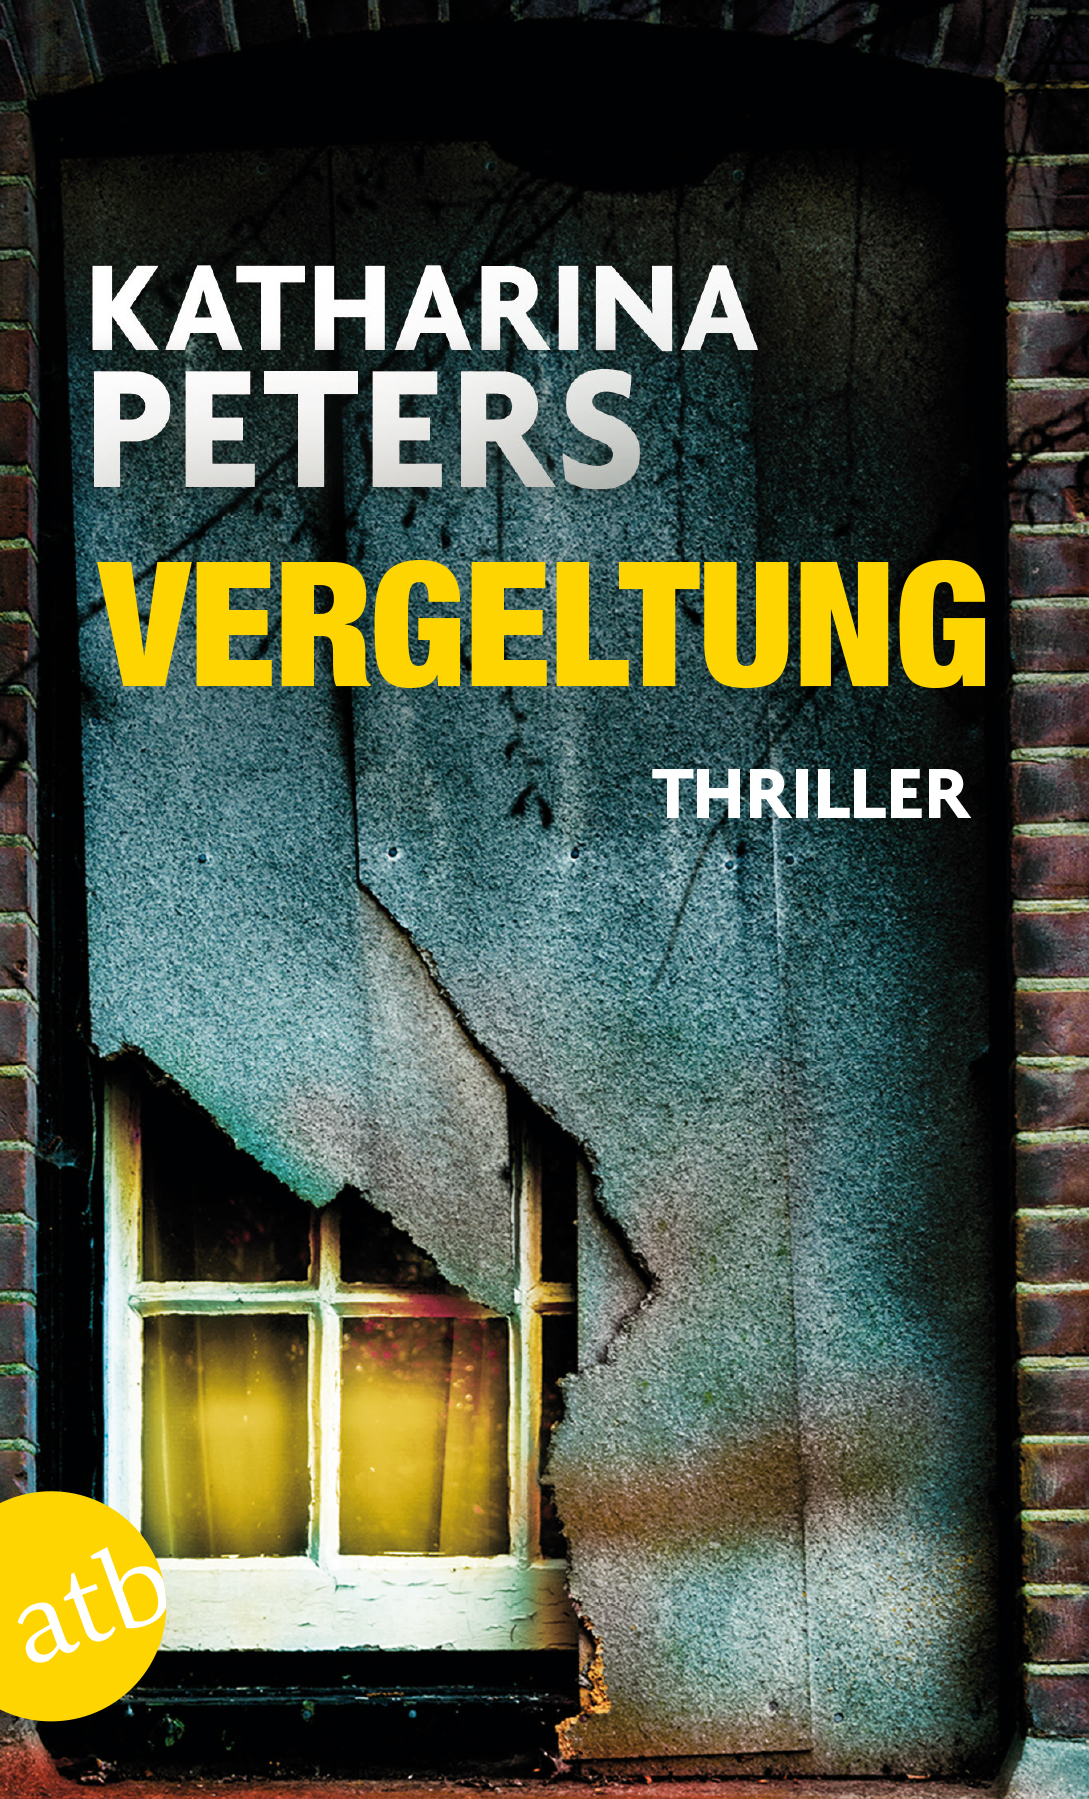 Books on Monday – KatharinaPeters